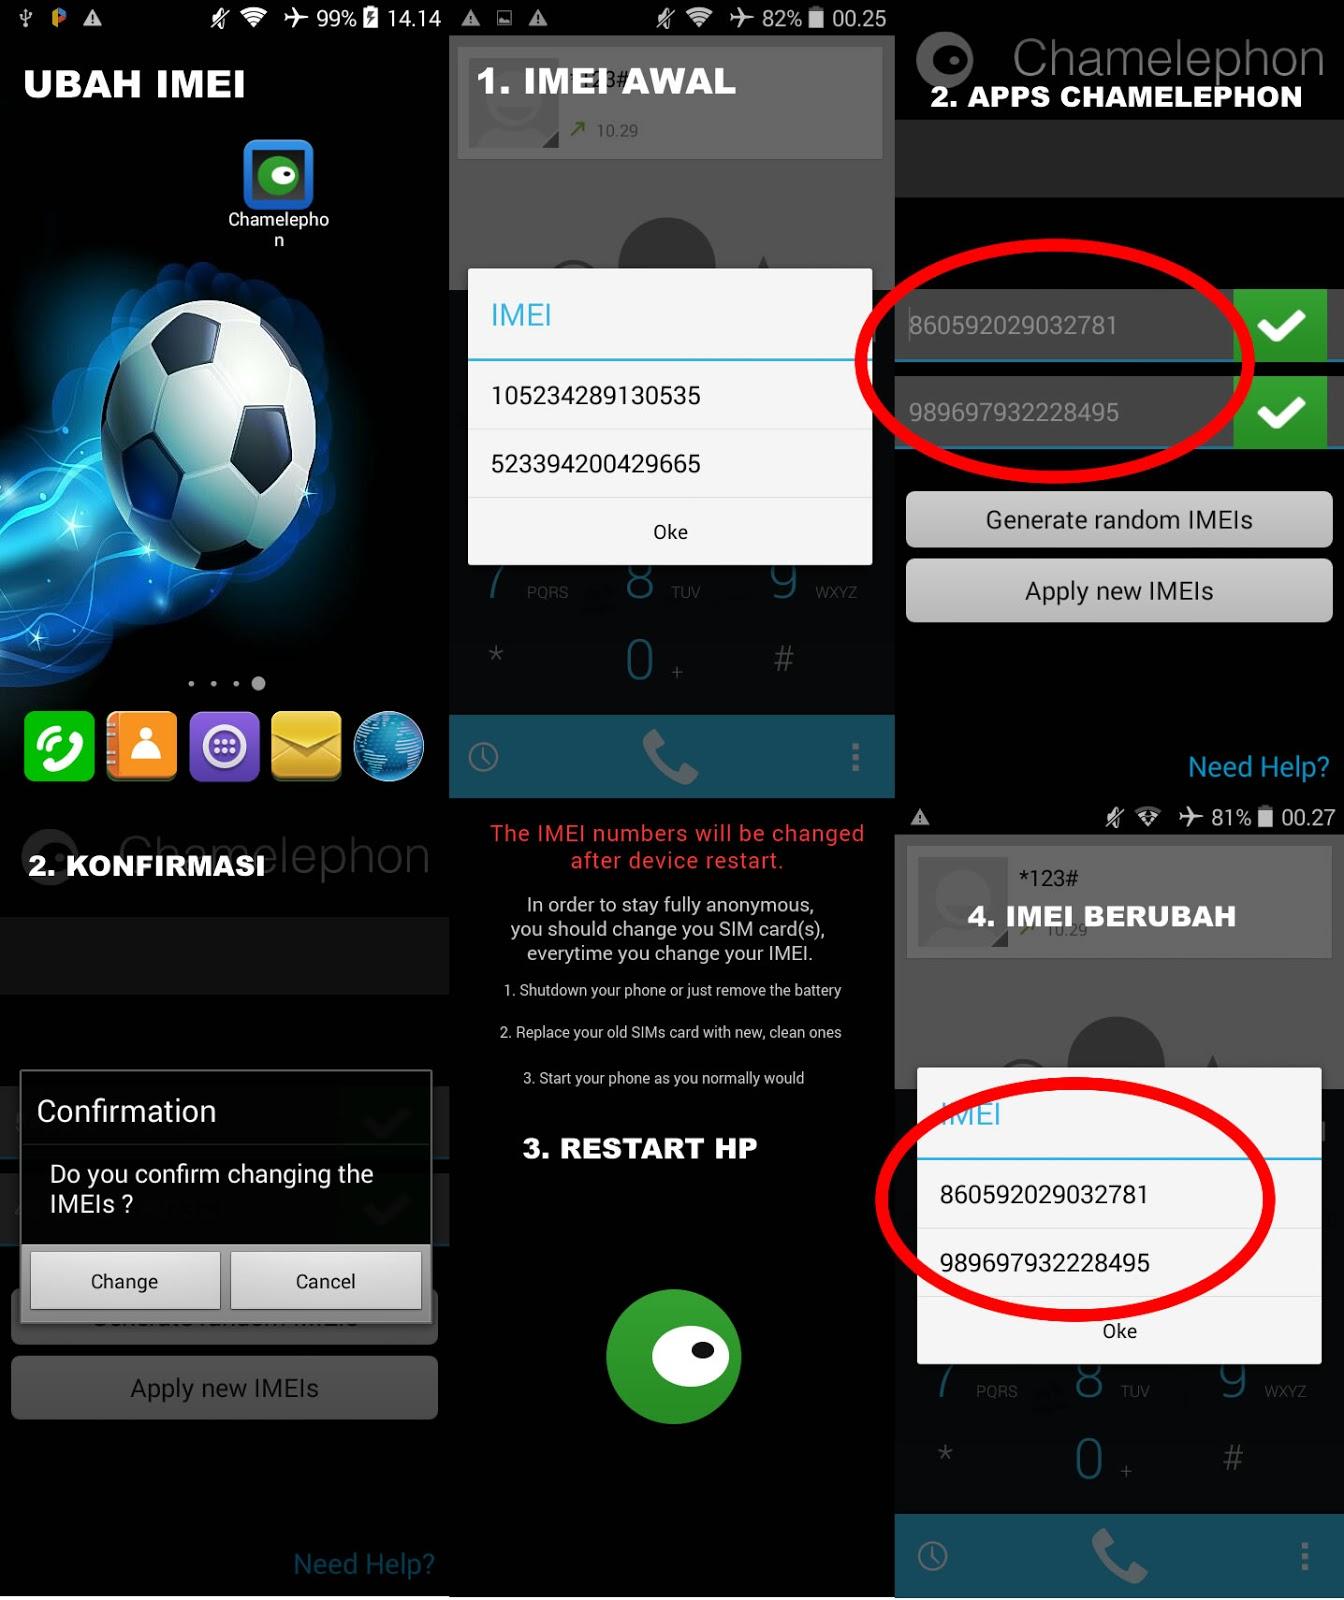 Cara Mudah Mengganti IMEI di Android Tanpa Komputer PC